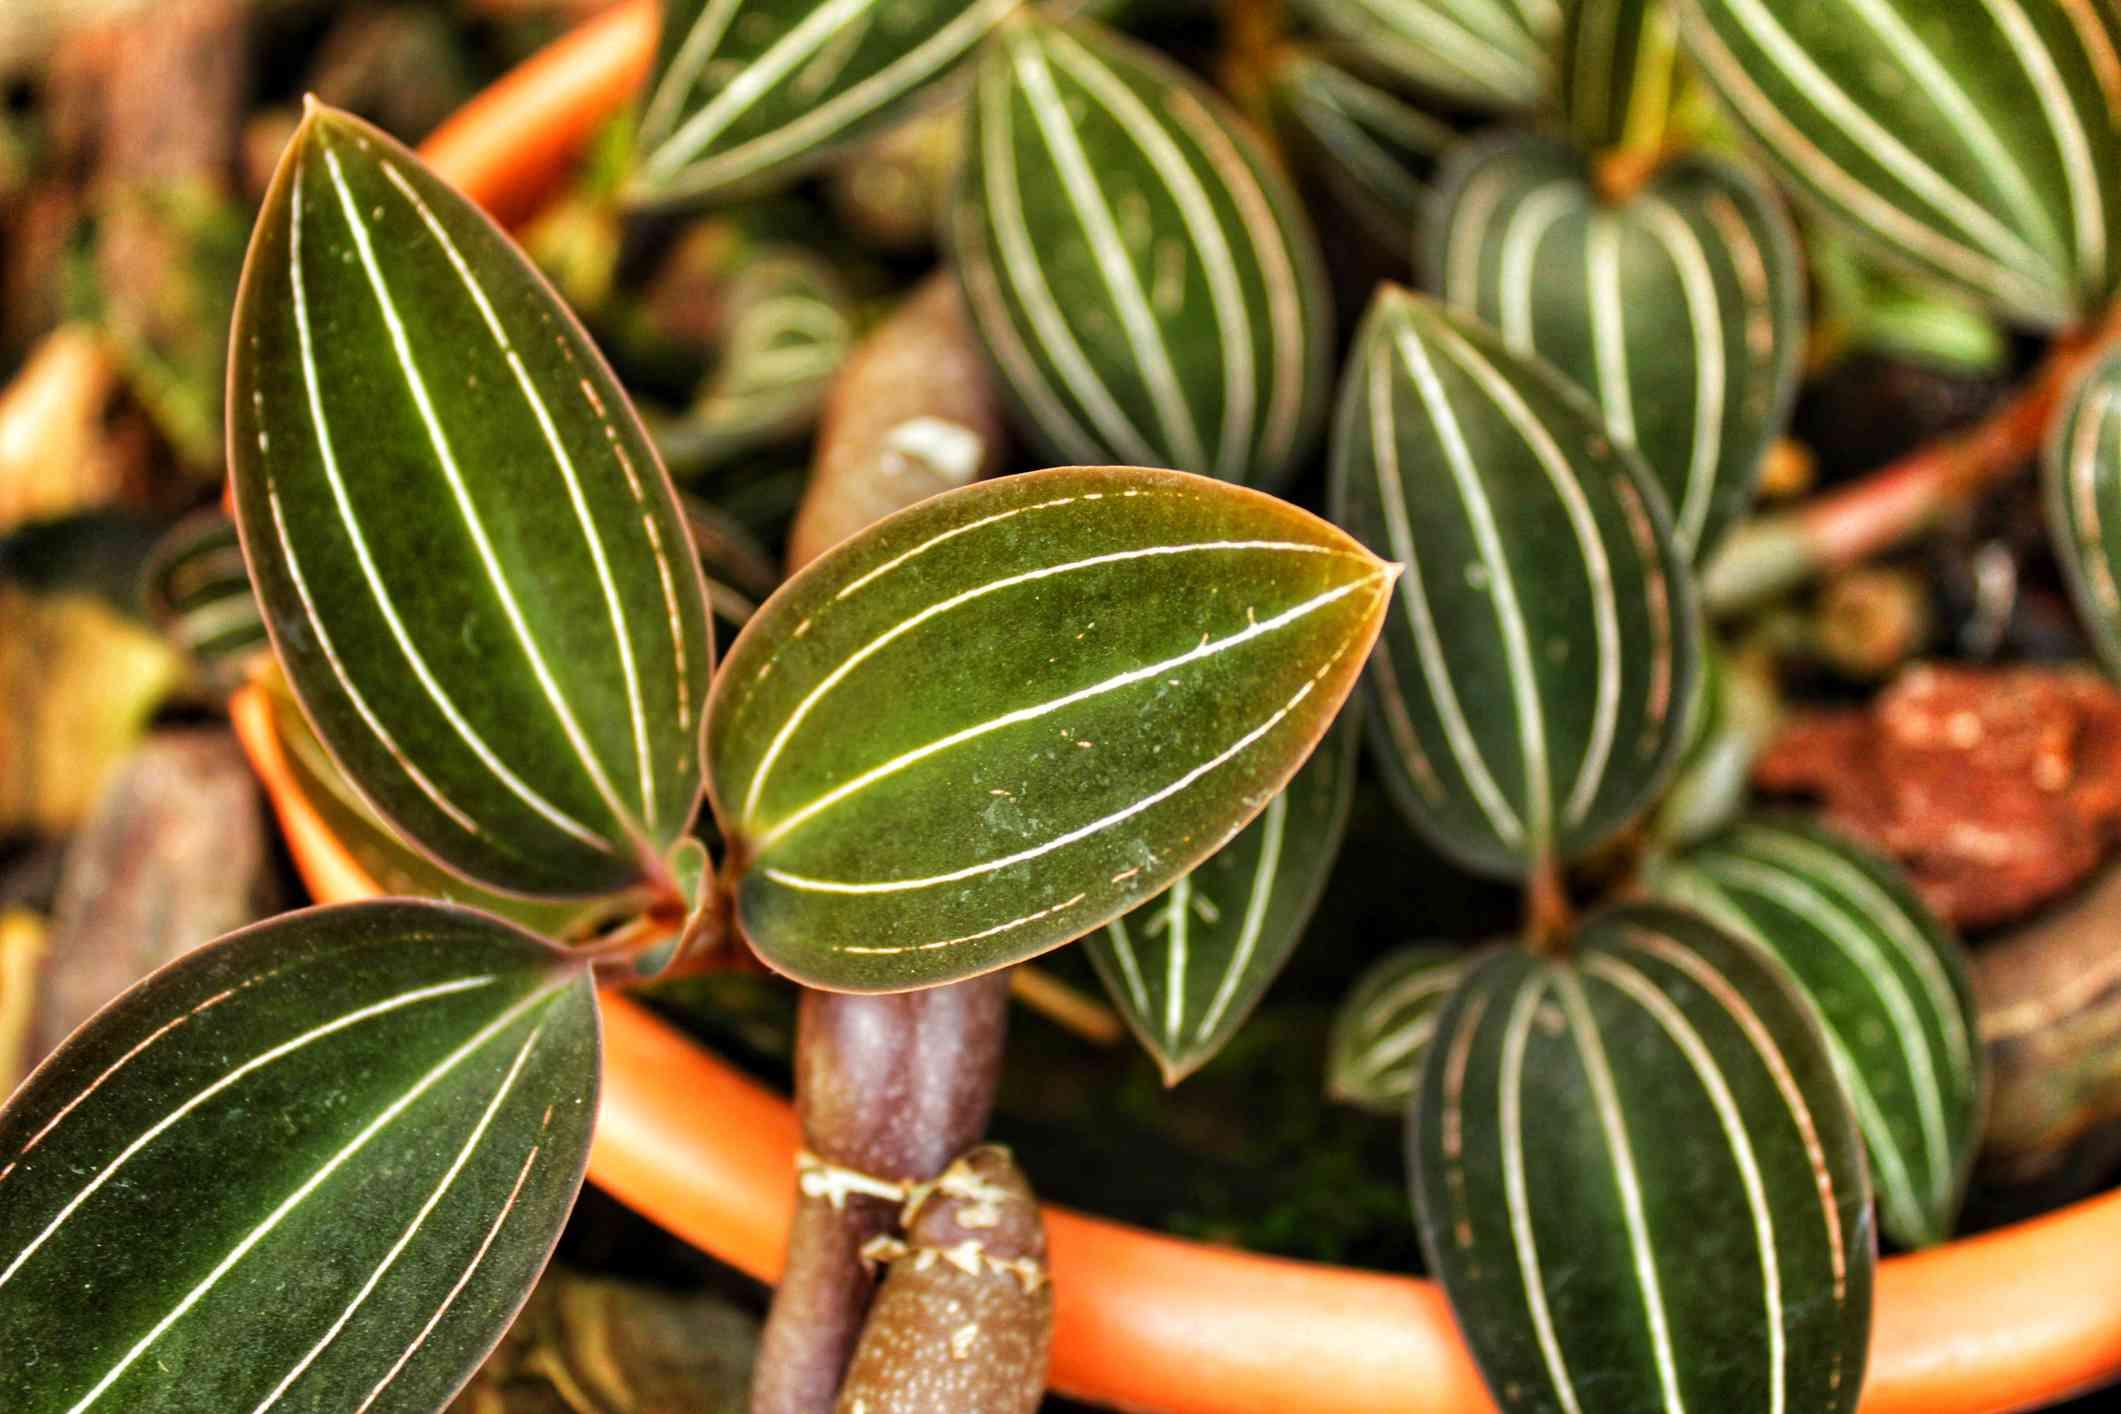 Jewel orchid (Ludisia discolor) in a pot